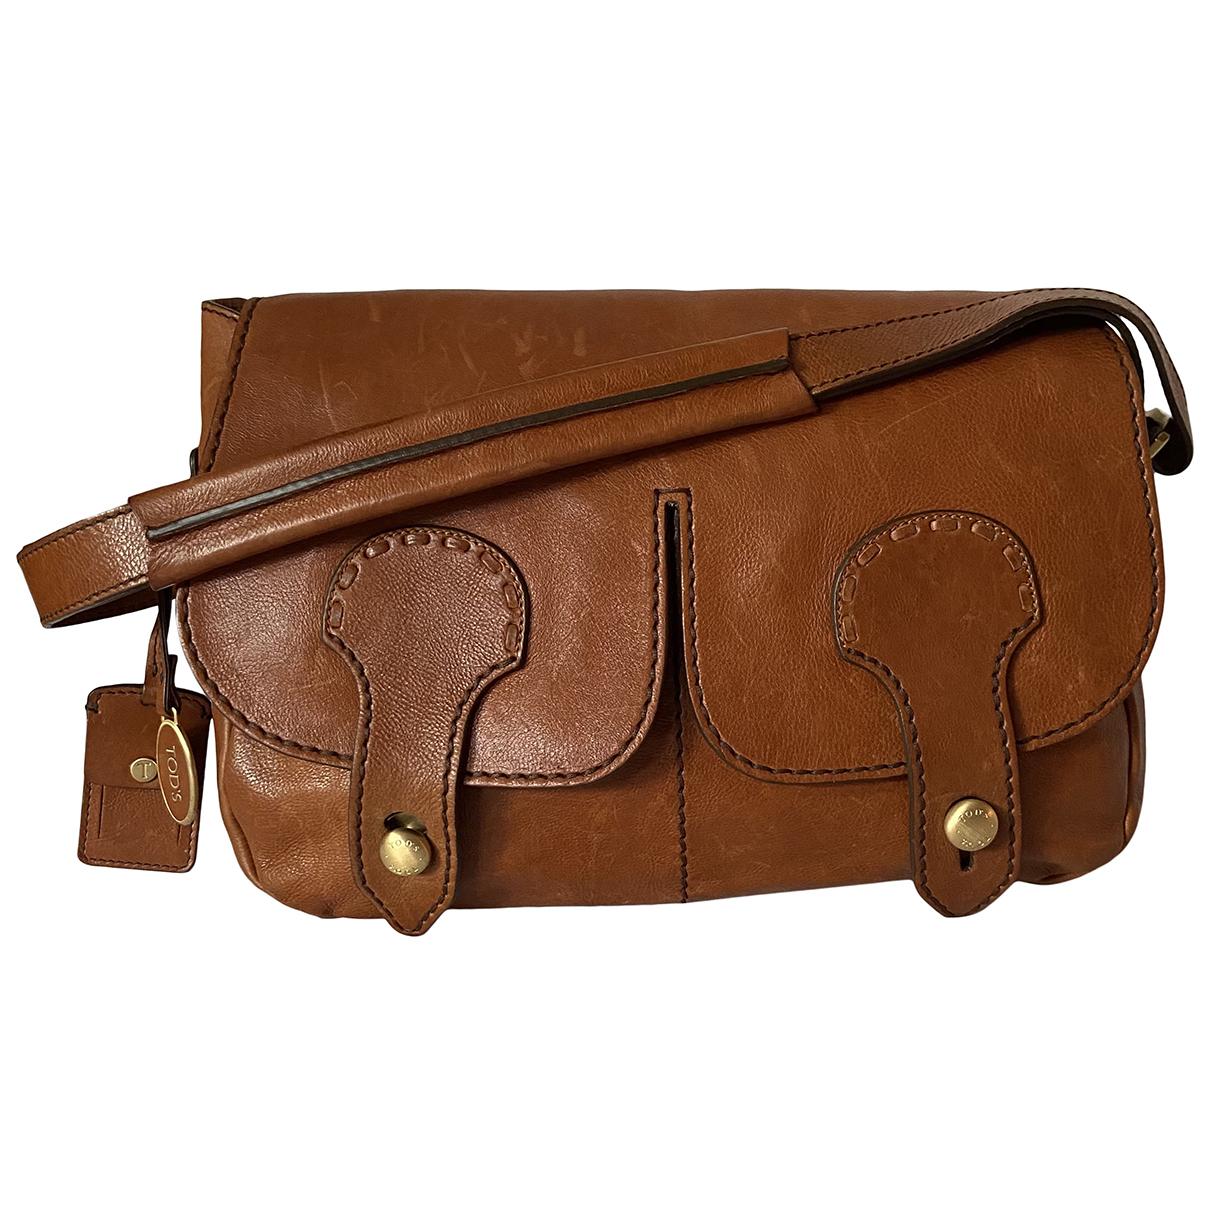 Tods N Brown Leather handbag for Women N